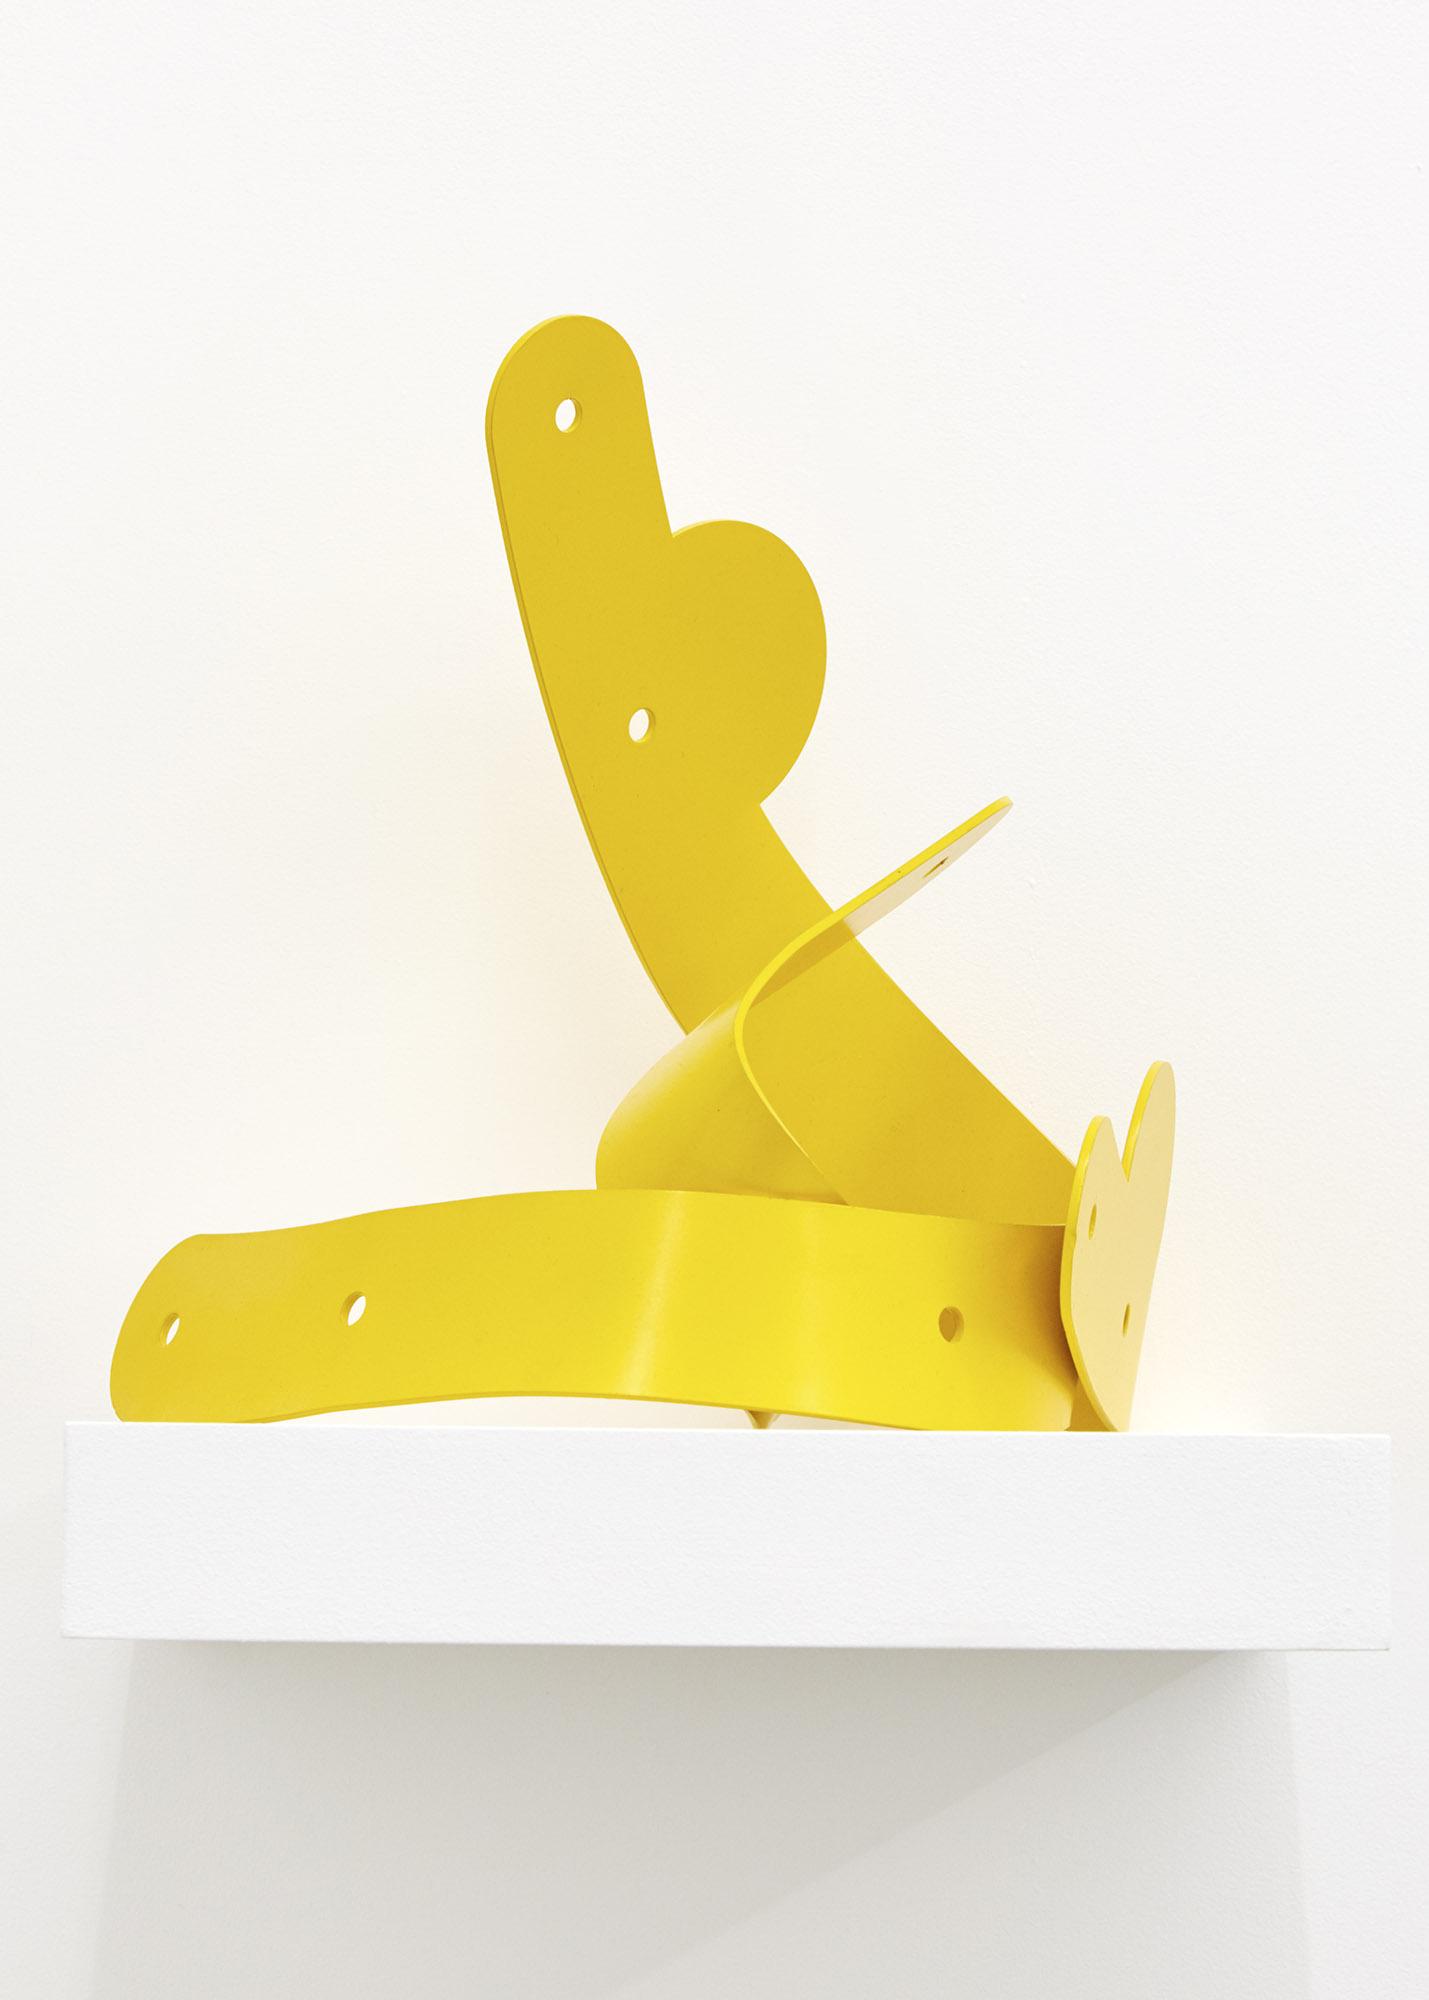 Yellow Trophy Lasercut and powder coated aluminium 30 x 40 x 30cm, 2019